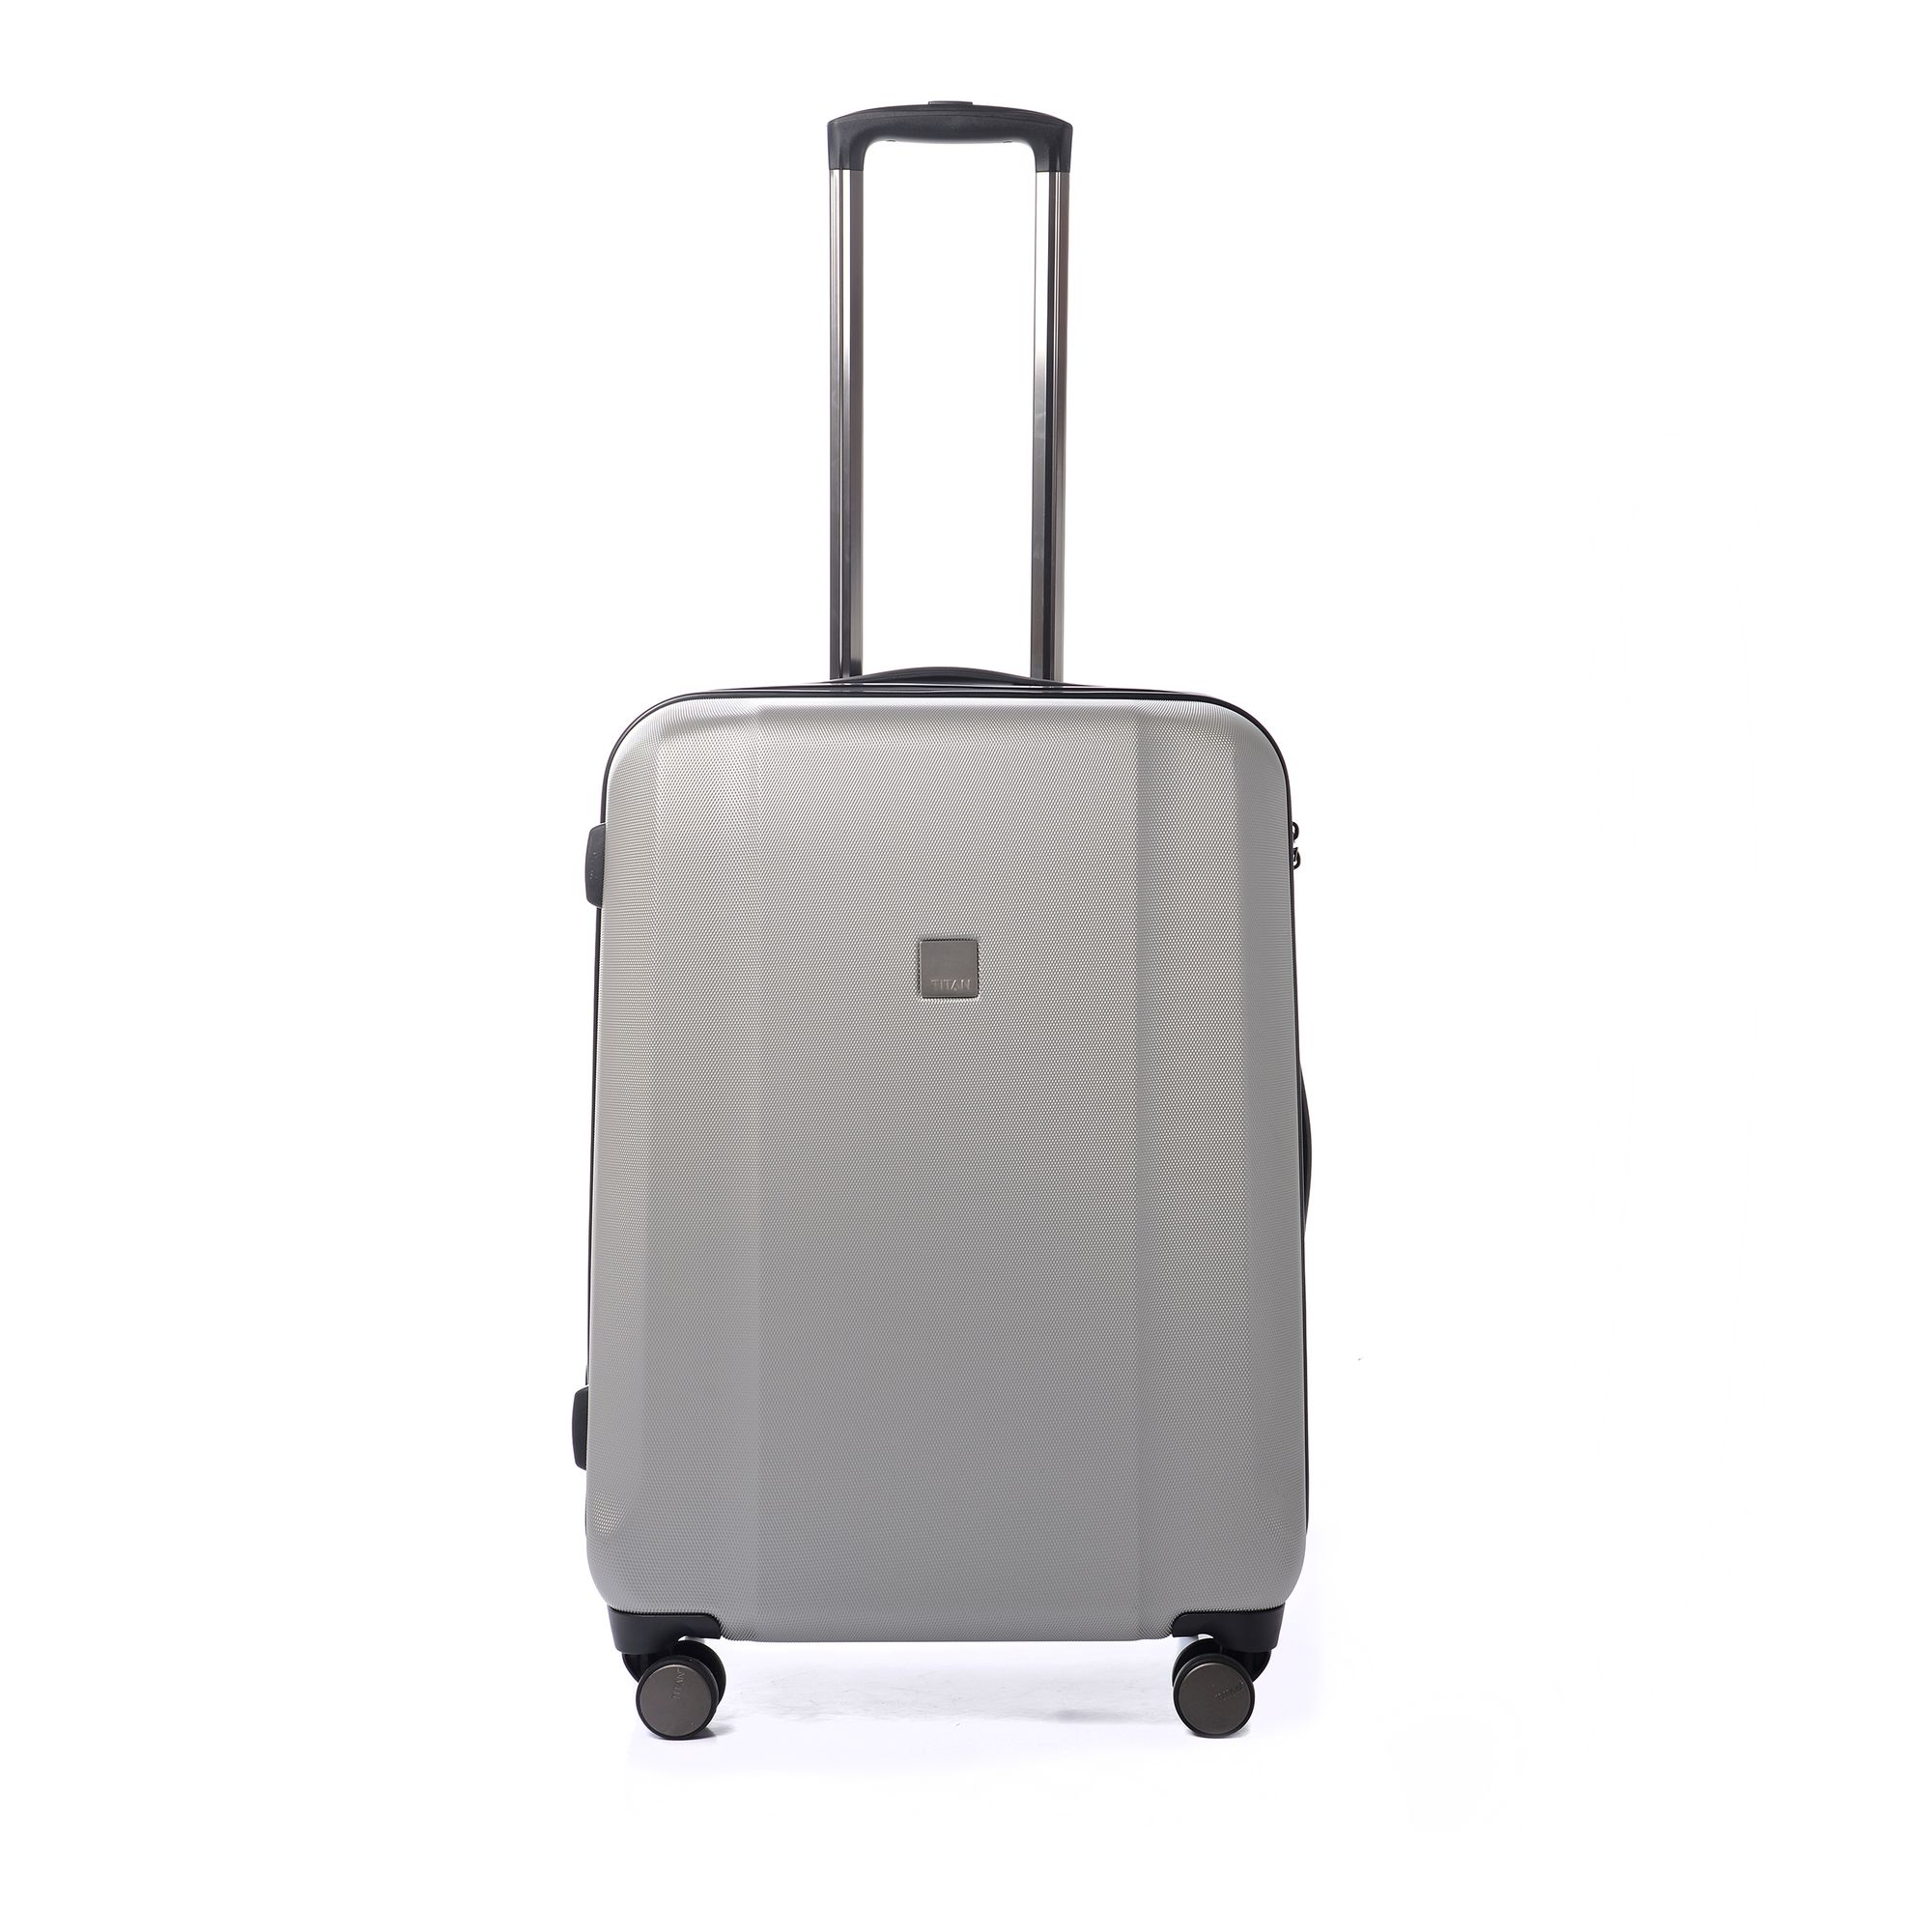 Handla online Titan Xenon Arctic hård resväska, 4 hjul, 55